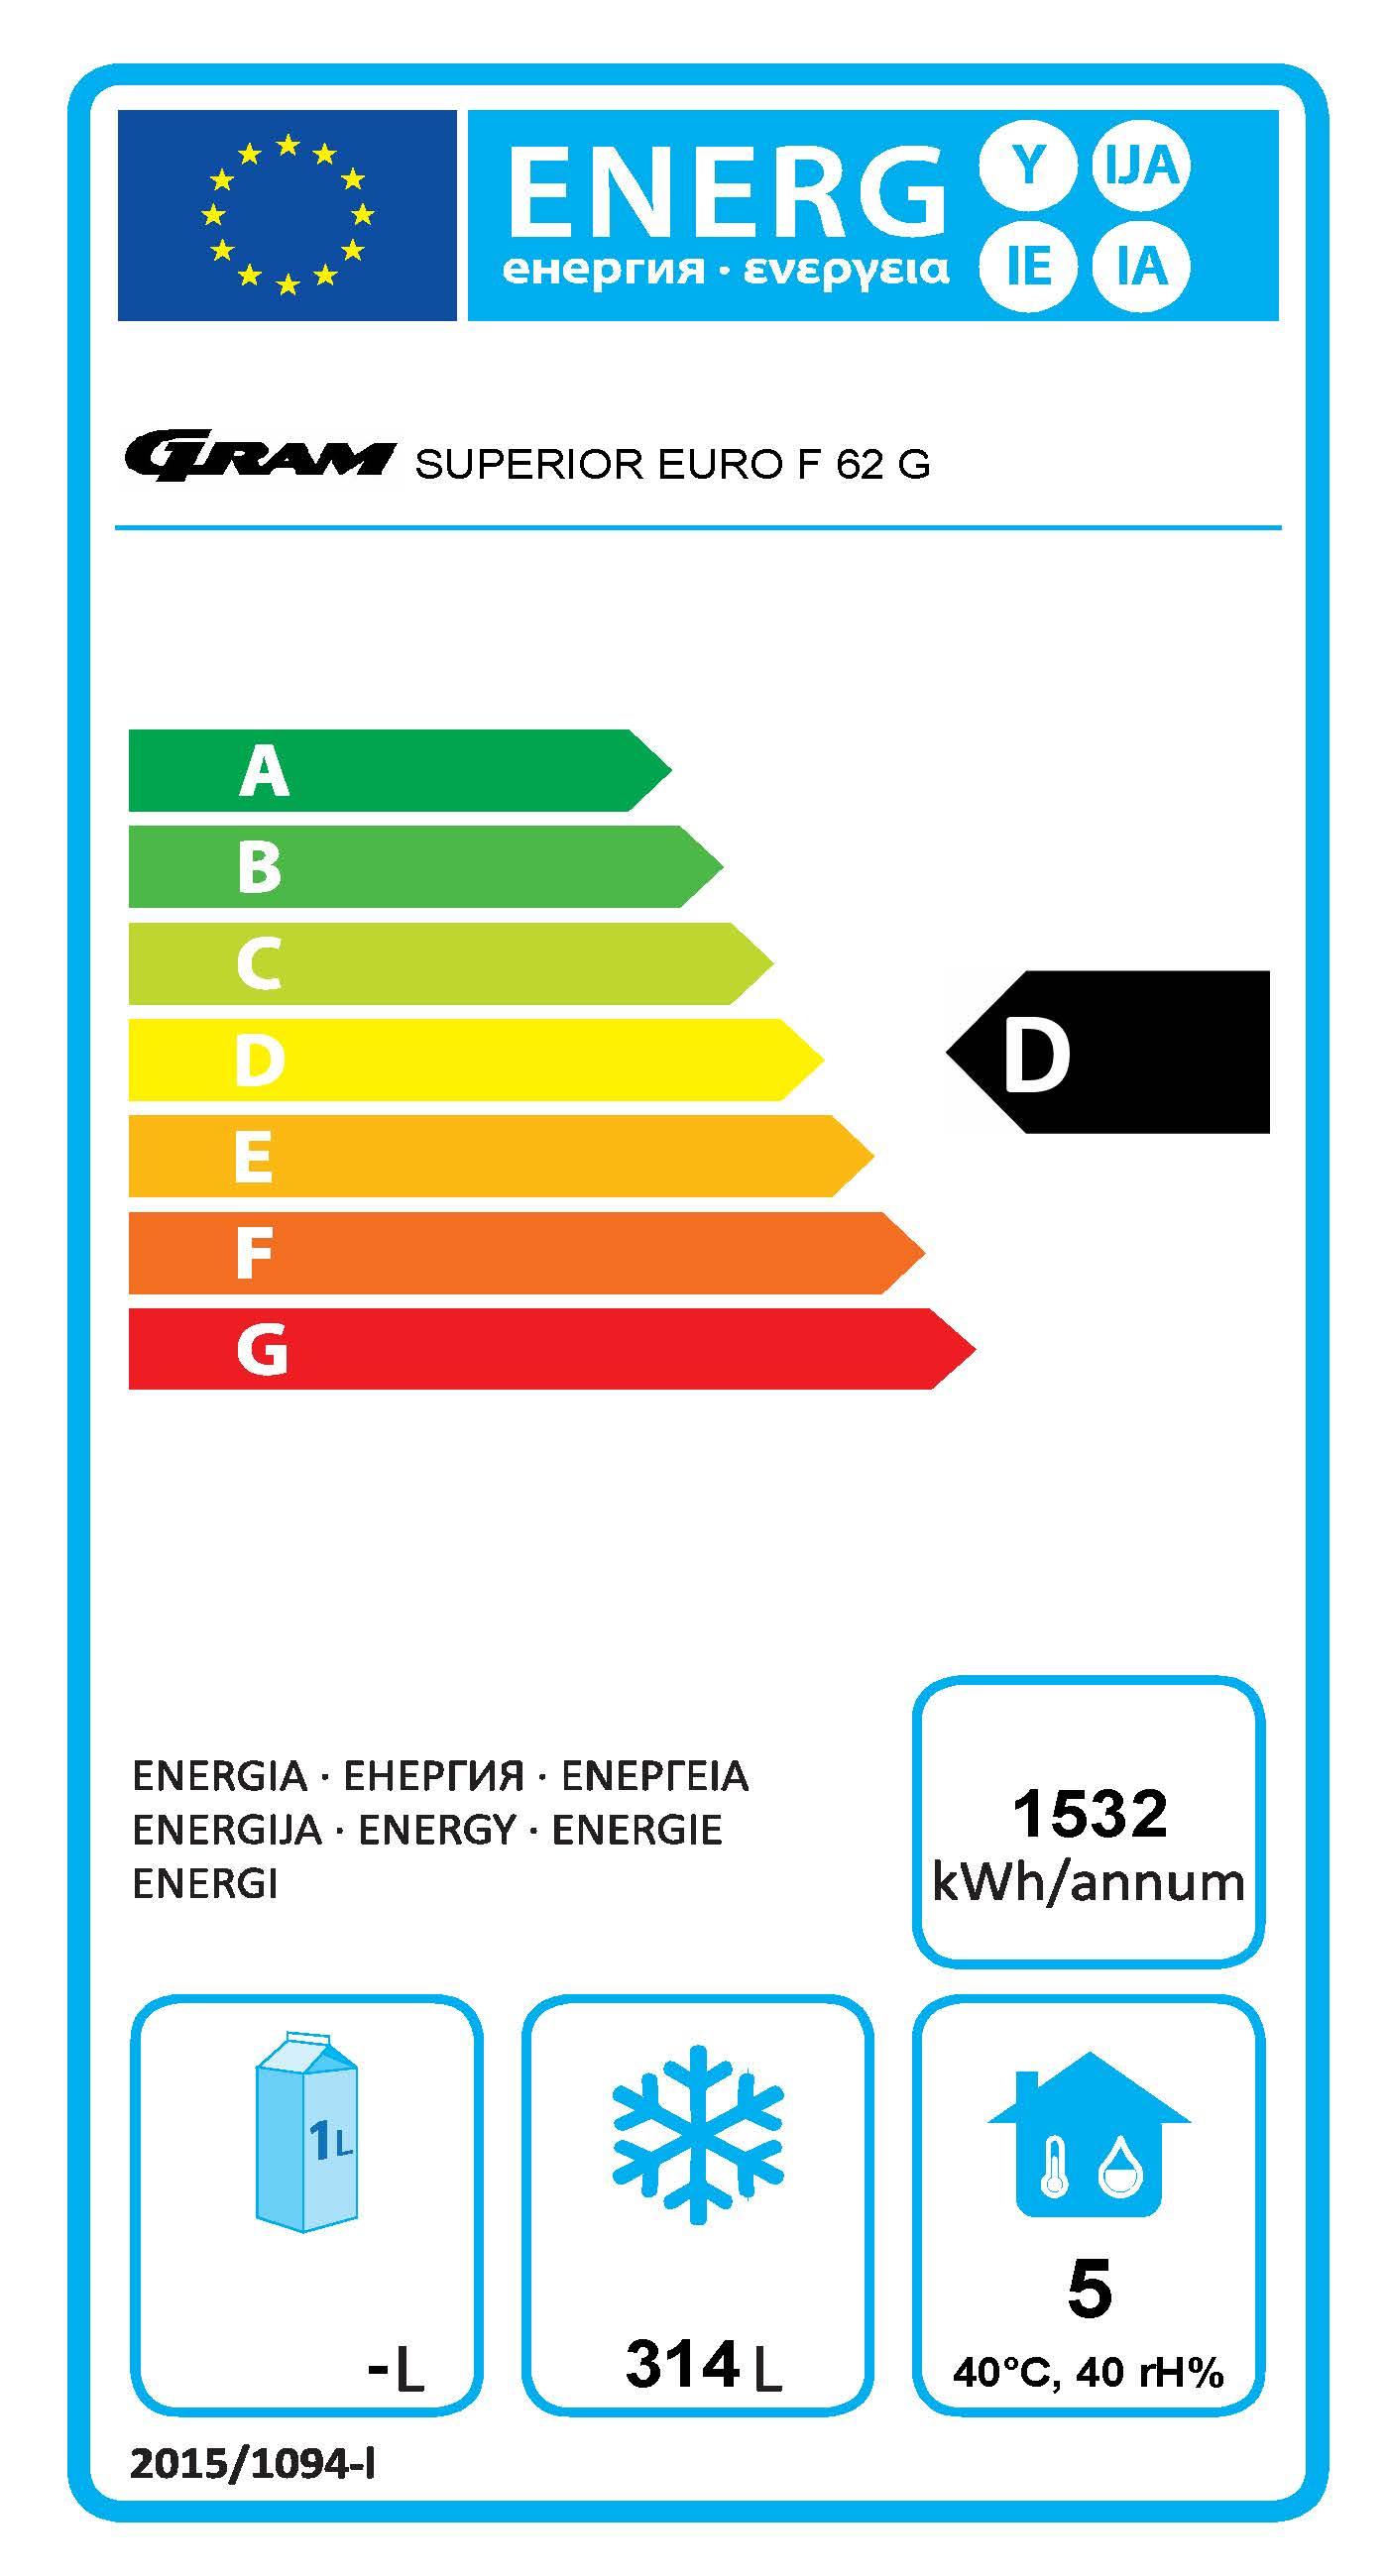 SUPERIOR EURO F 62 LAG C1 4S 465 Ltr Upright Freezer Energy Rating